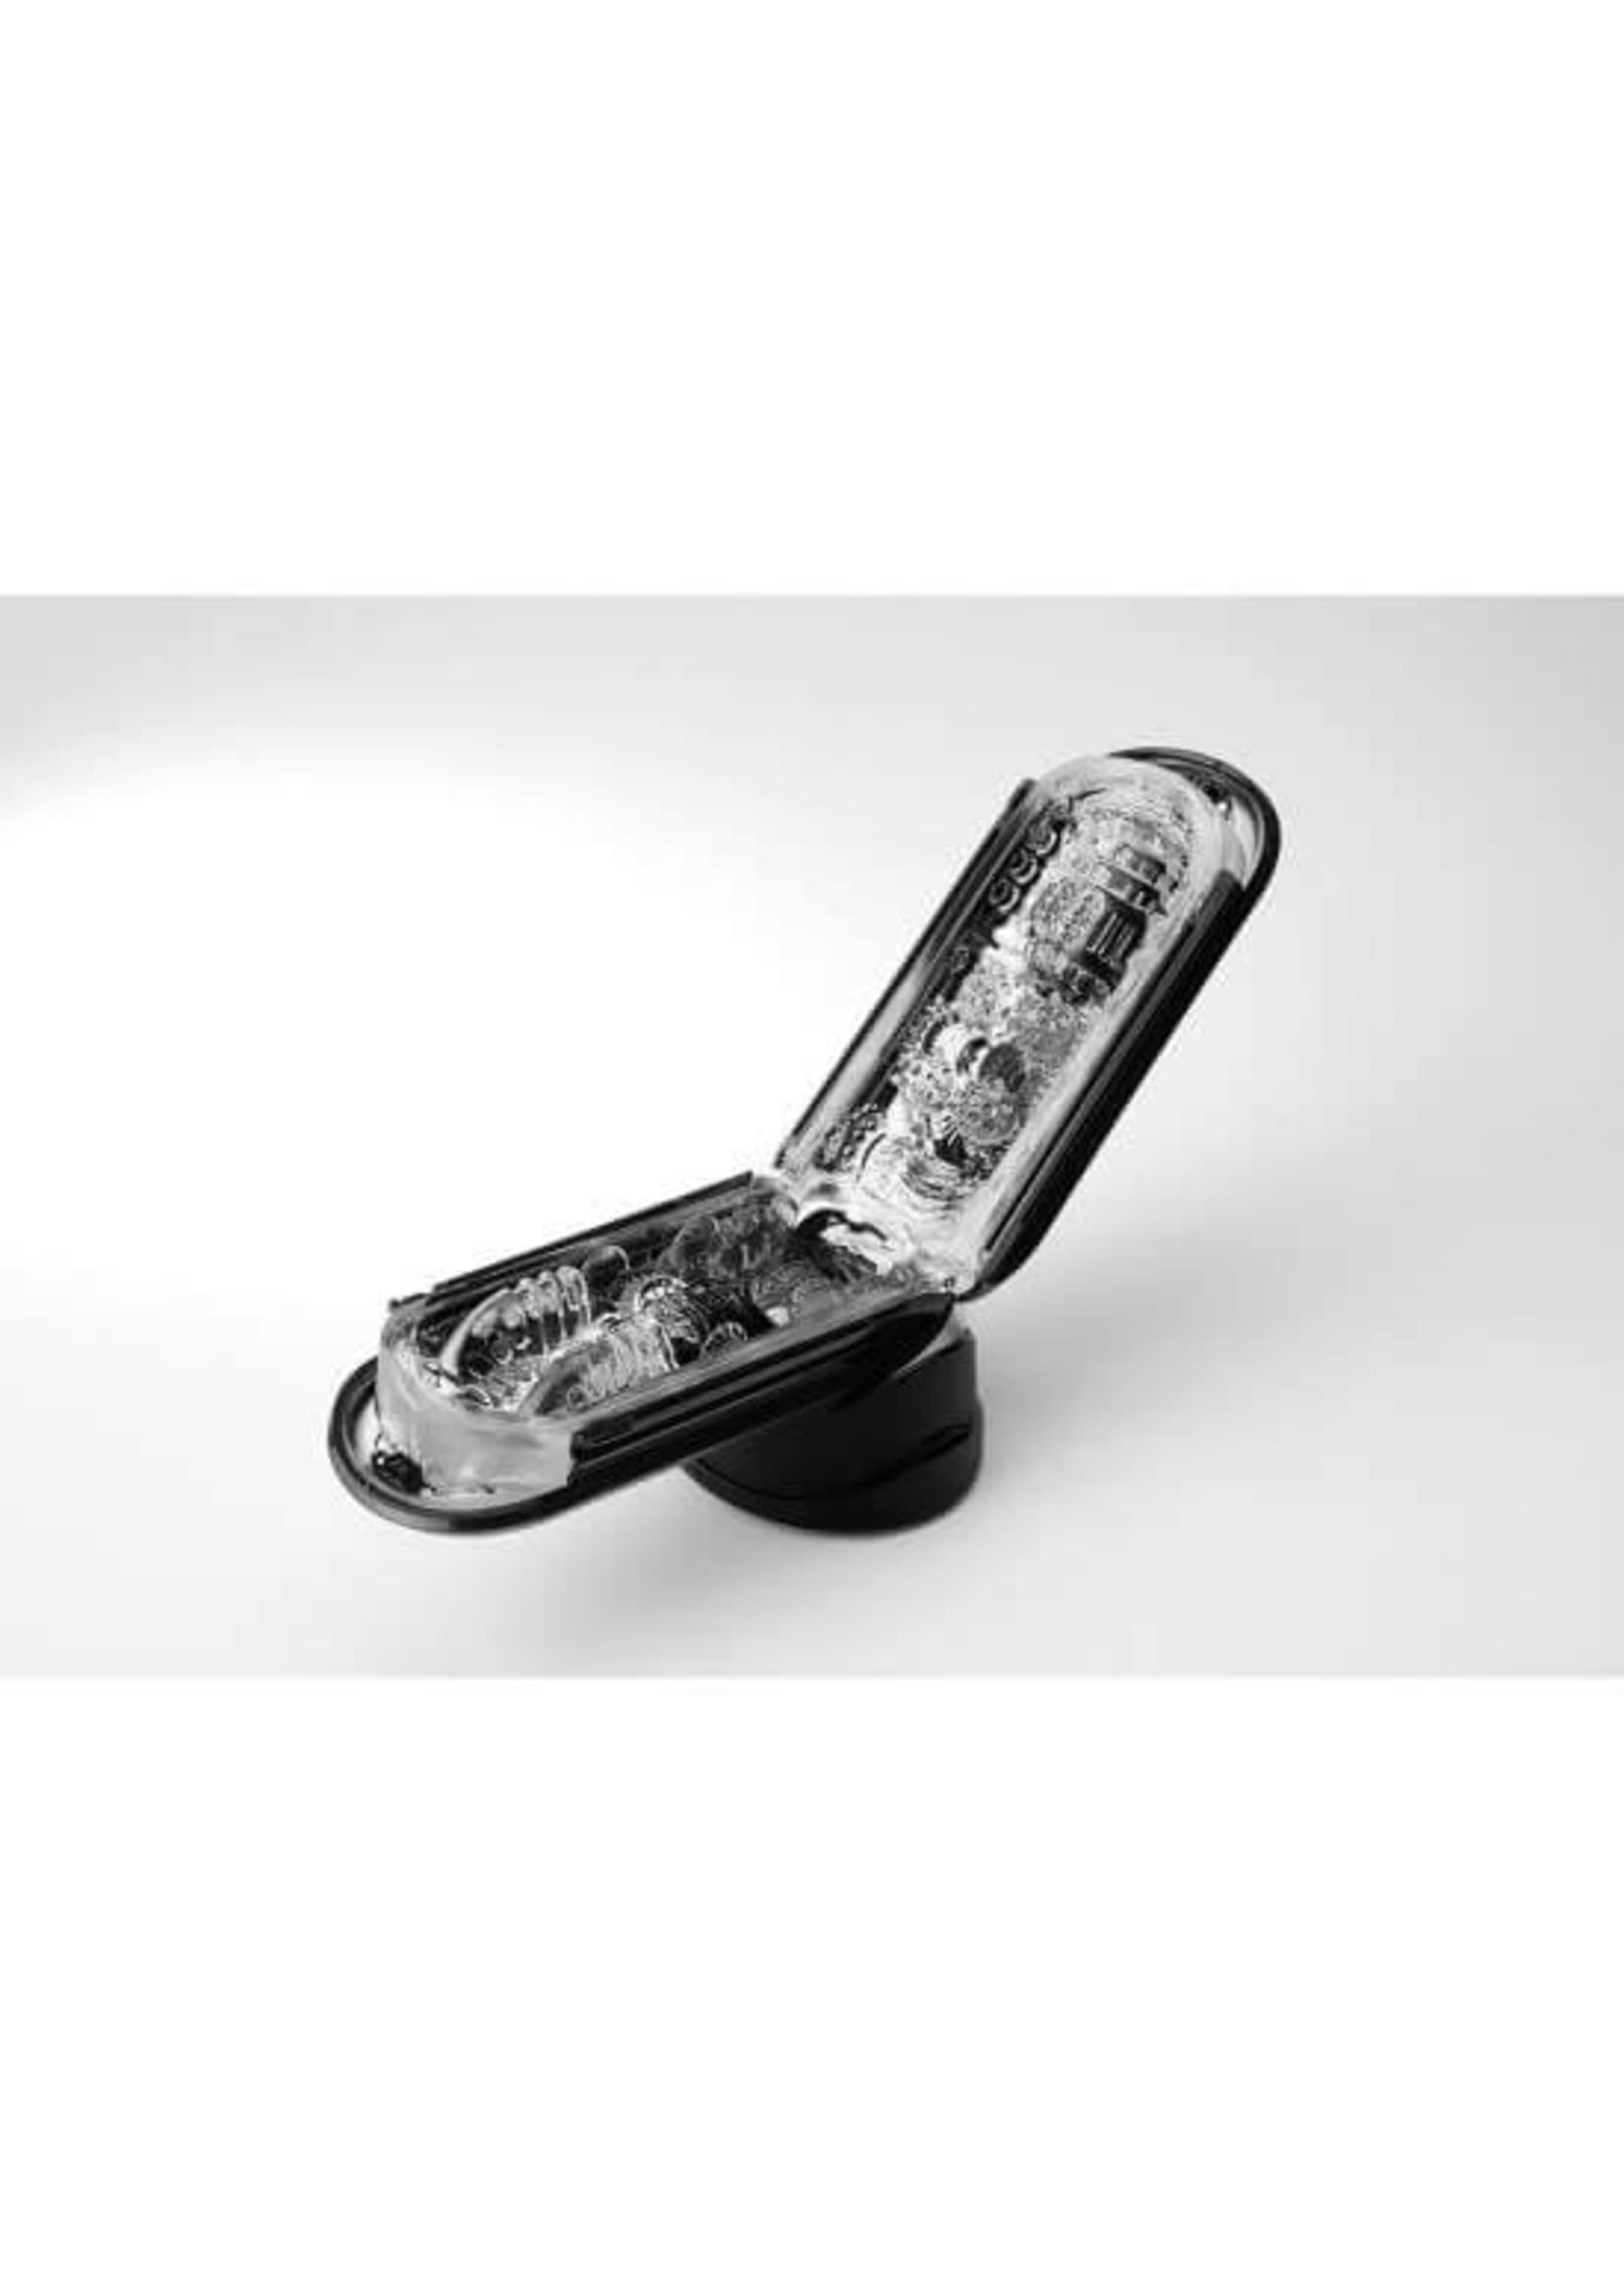 Tenga Tenga Flip Zero Black Vibrating